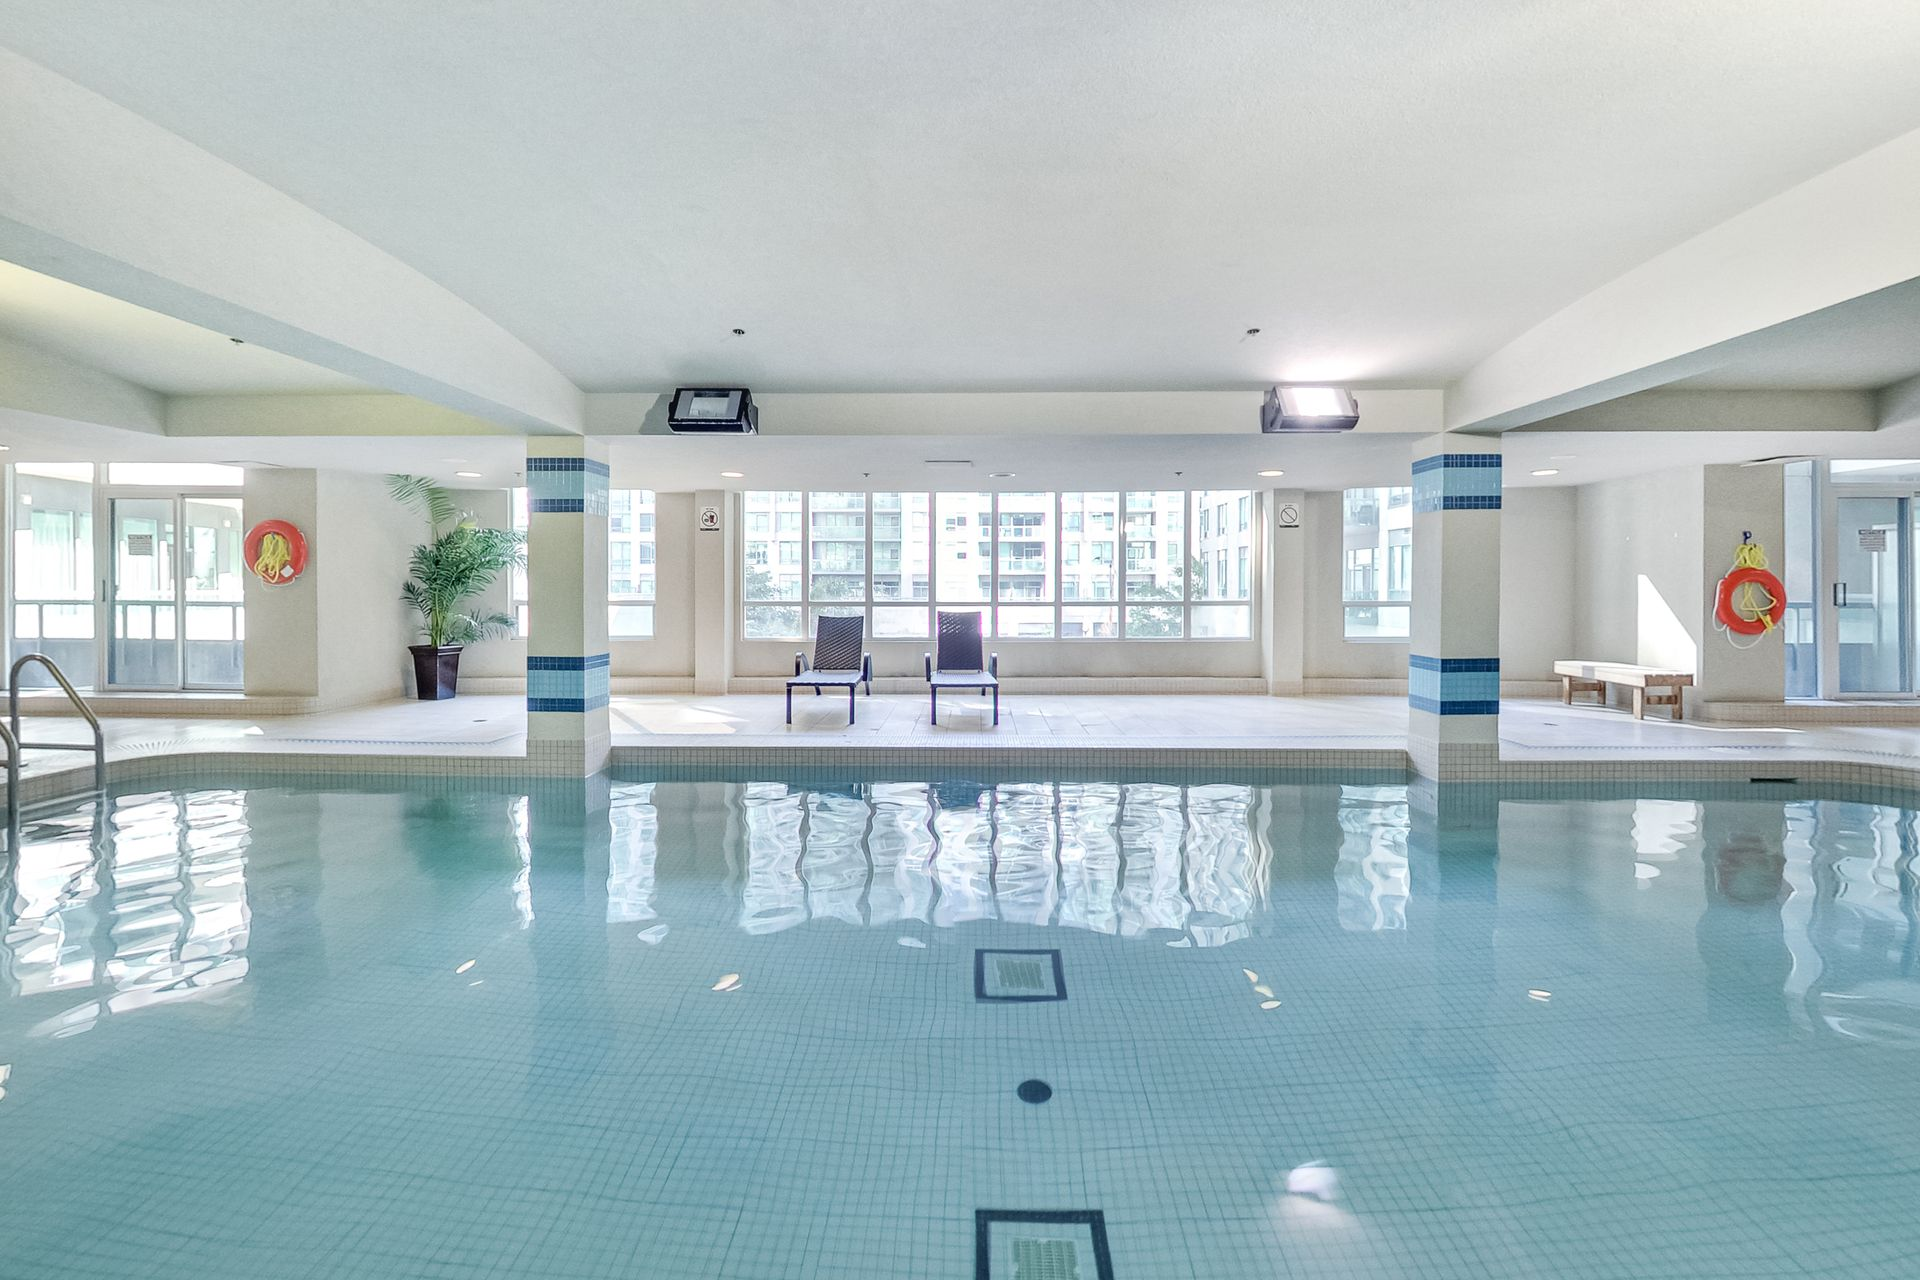 Indoor Swimming Pool at 505 - 51 Lower Simcoe Street, Waterfront Communities C1, Toronto